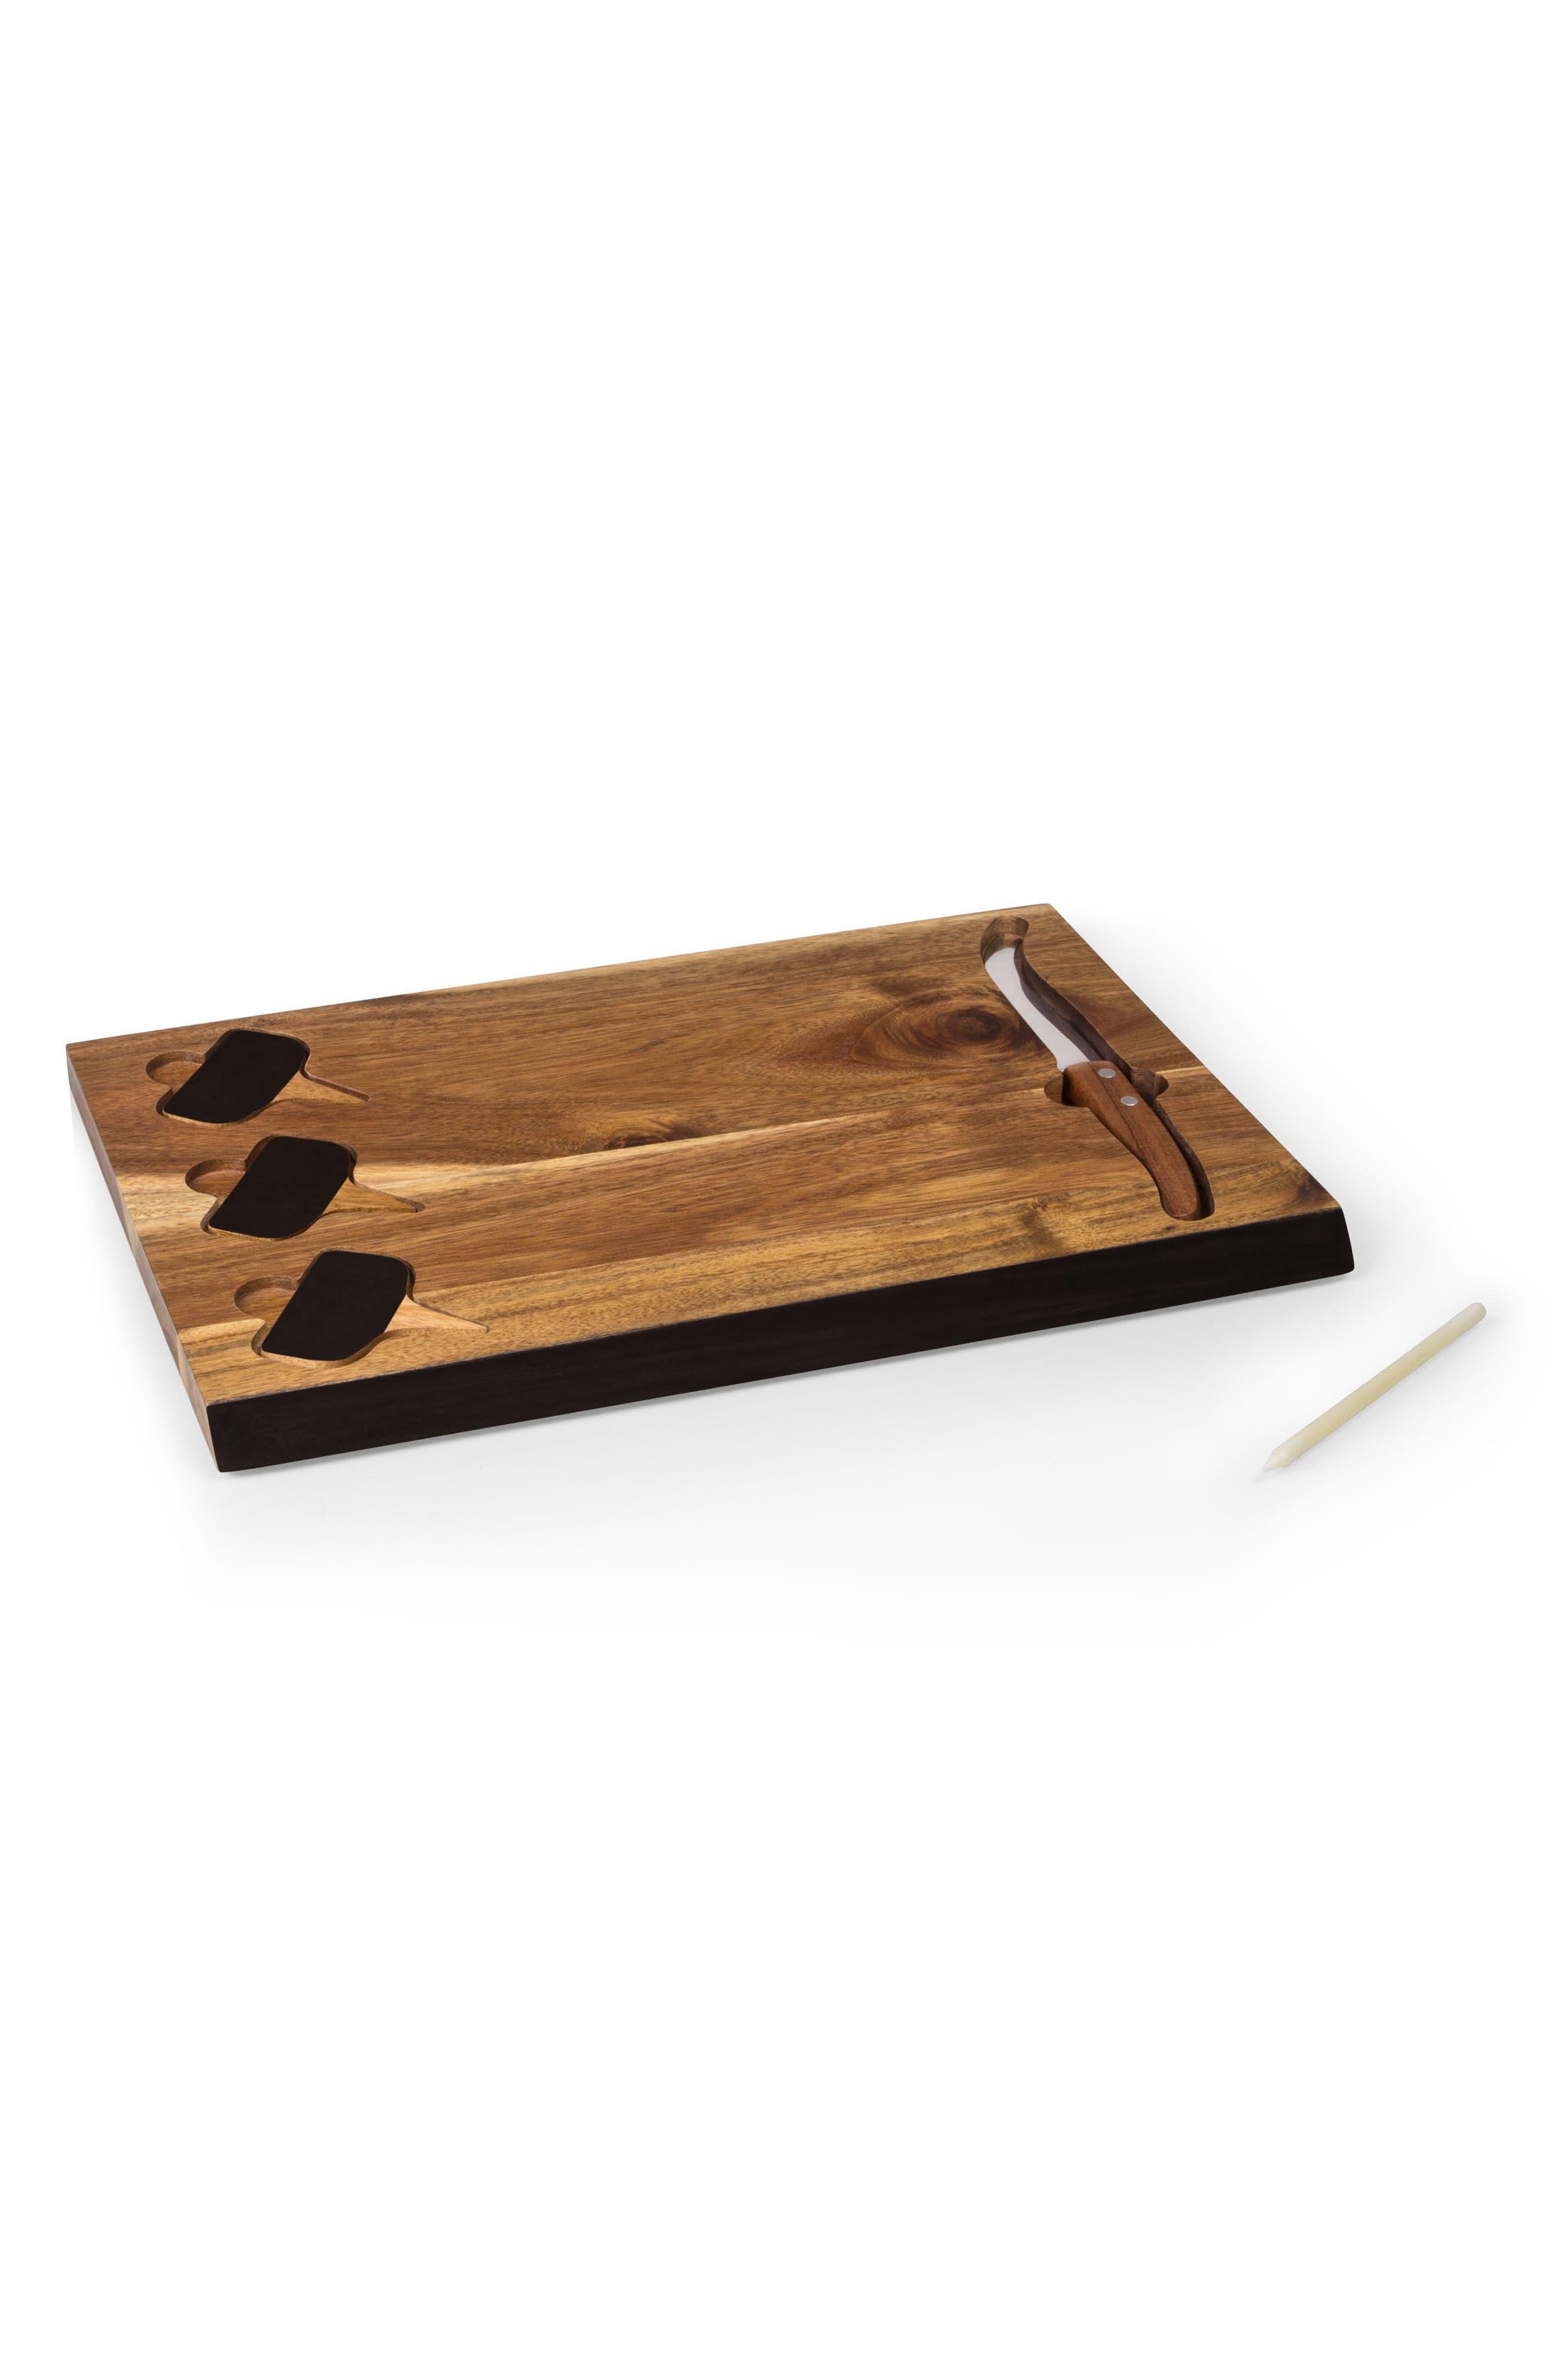 Picnic Time Delio Acacia Chalkboard Cheese Board & Tools Set